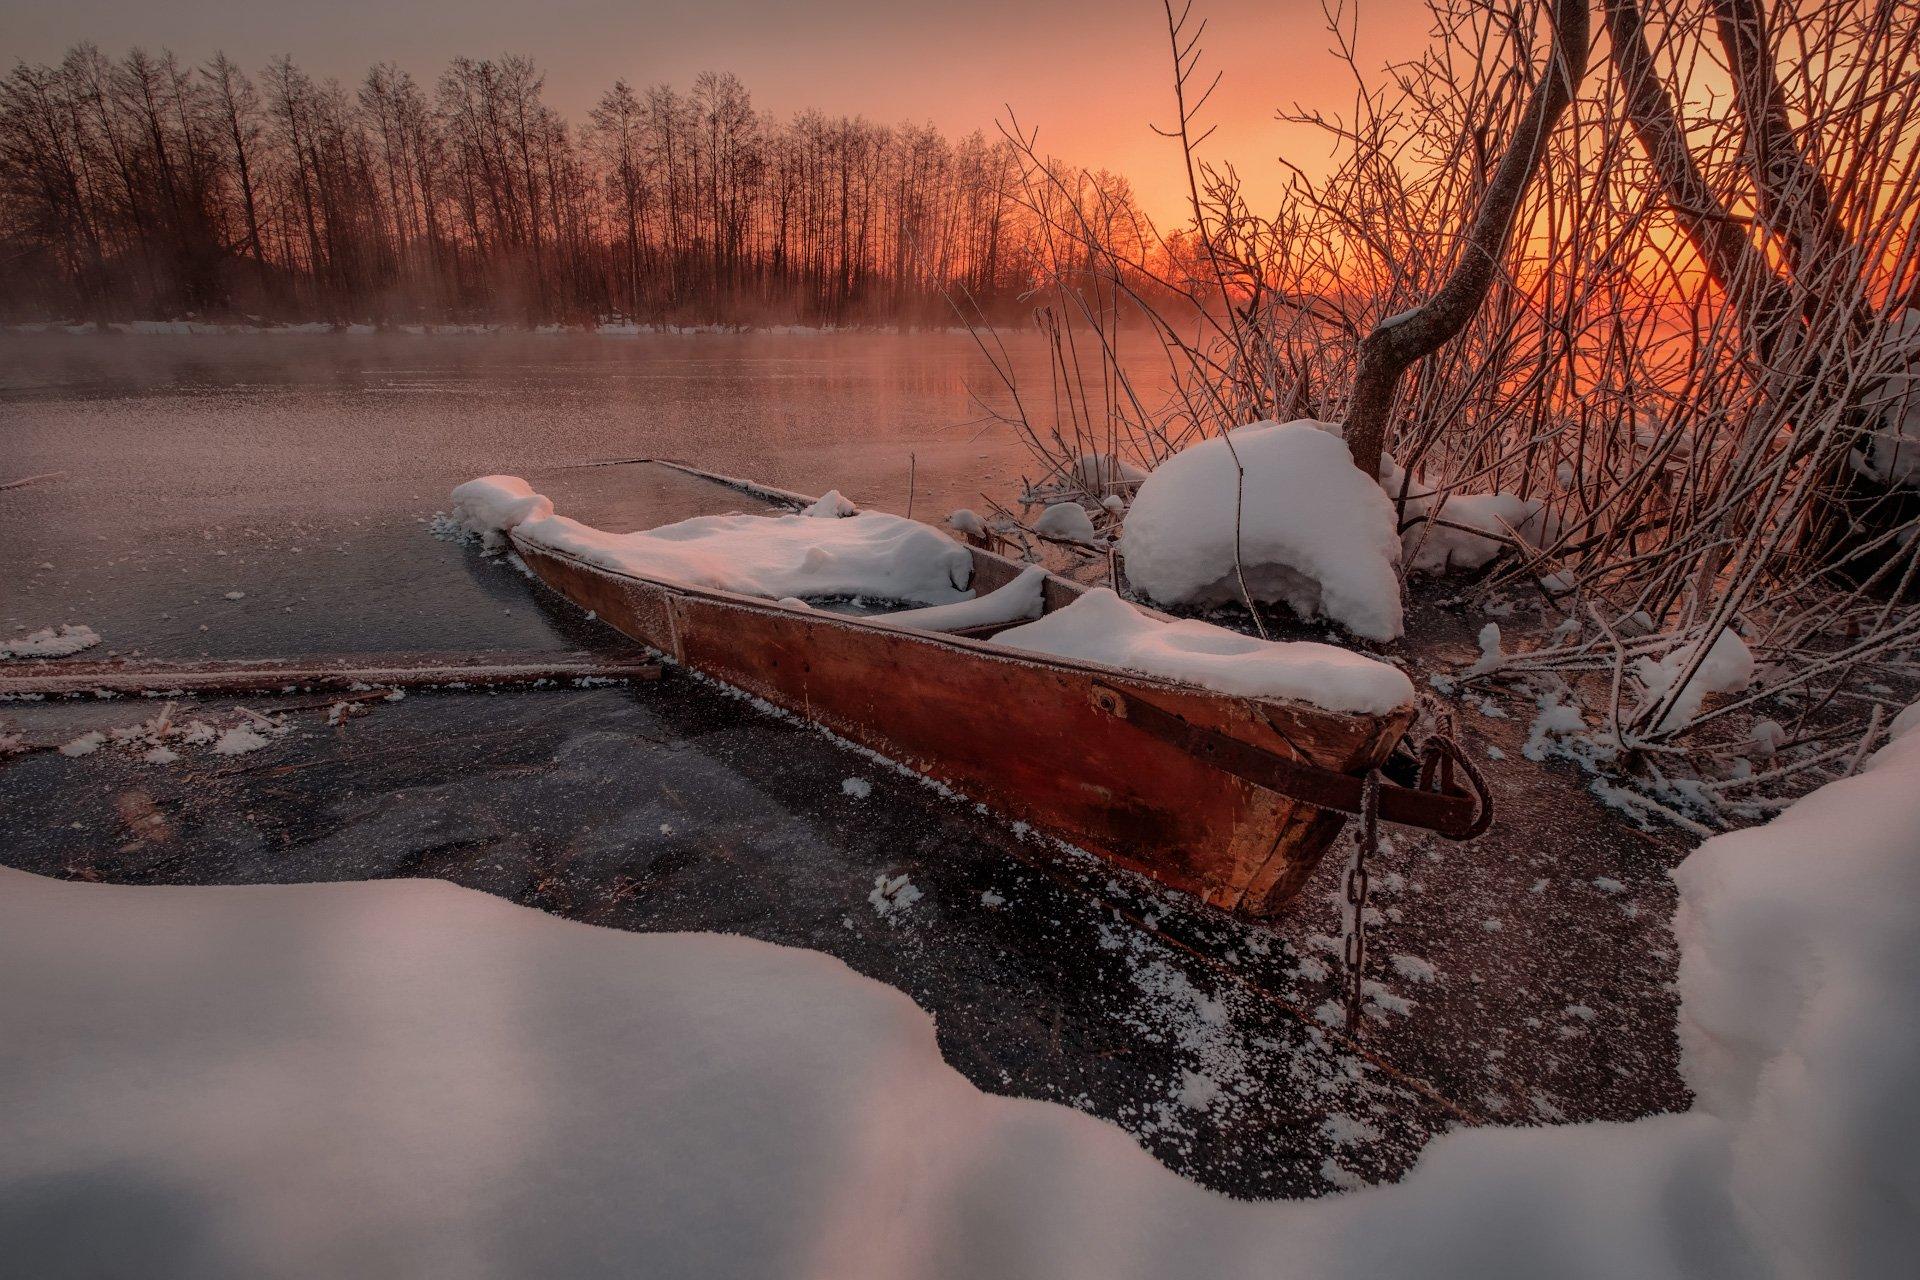 пейзаж, зима, пруд, озеро, снег, утро, рассвет, восход, мороз, холод, лодка, шатура, Андрей Чиж